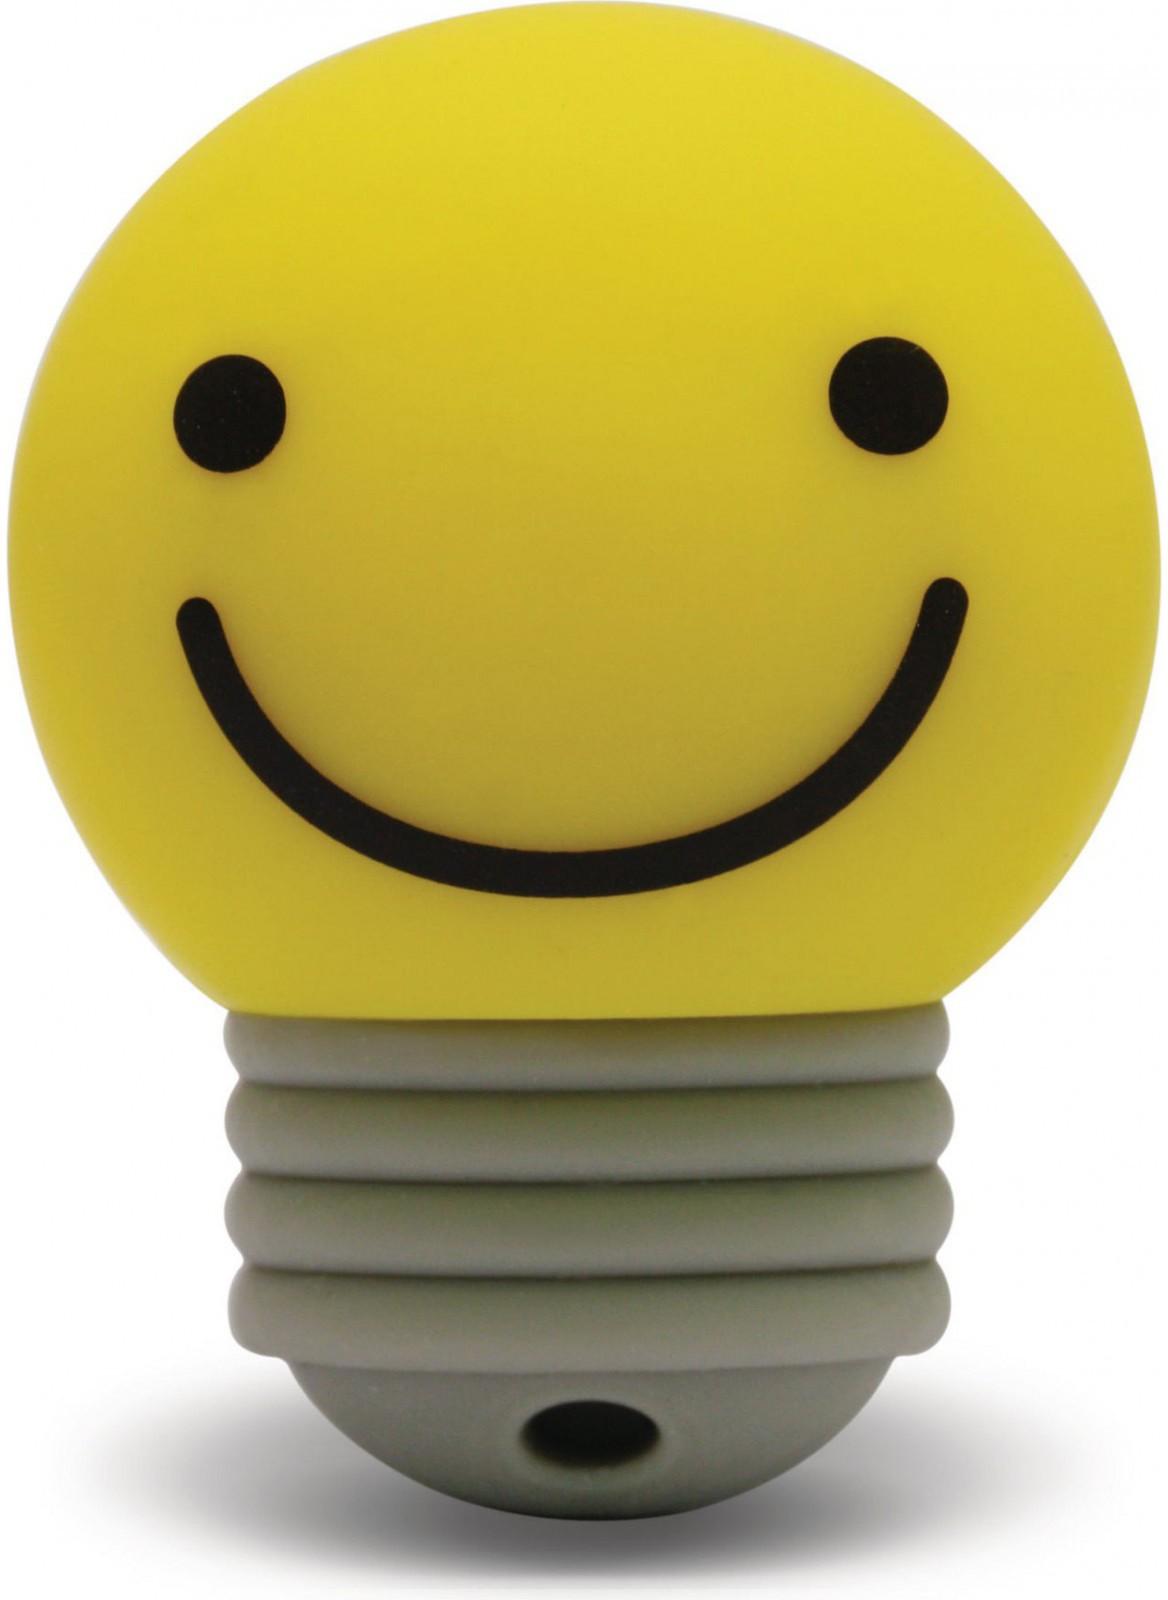 USB Flash Philips Power 16Gb Yellow - Фото 1